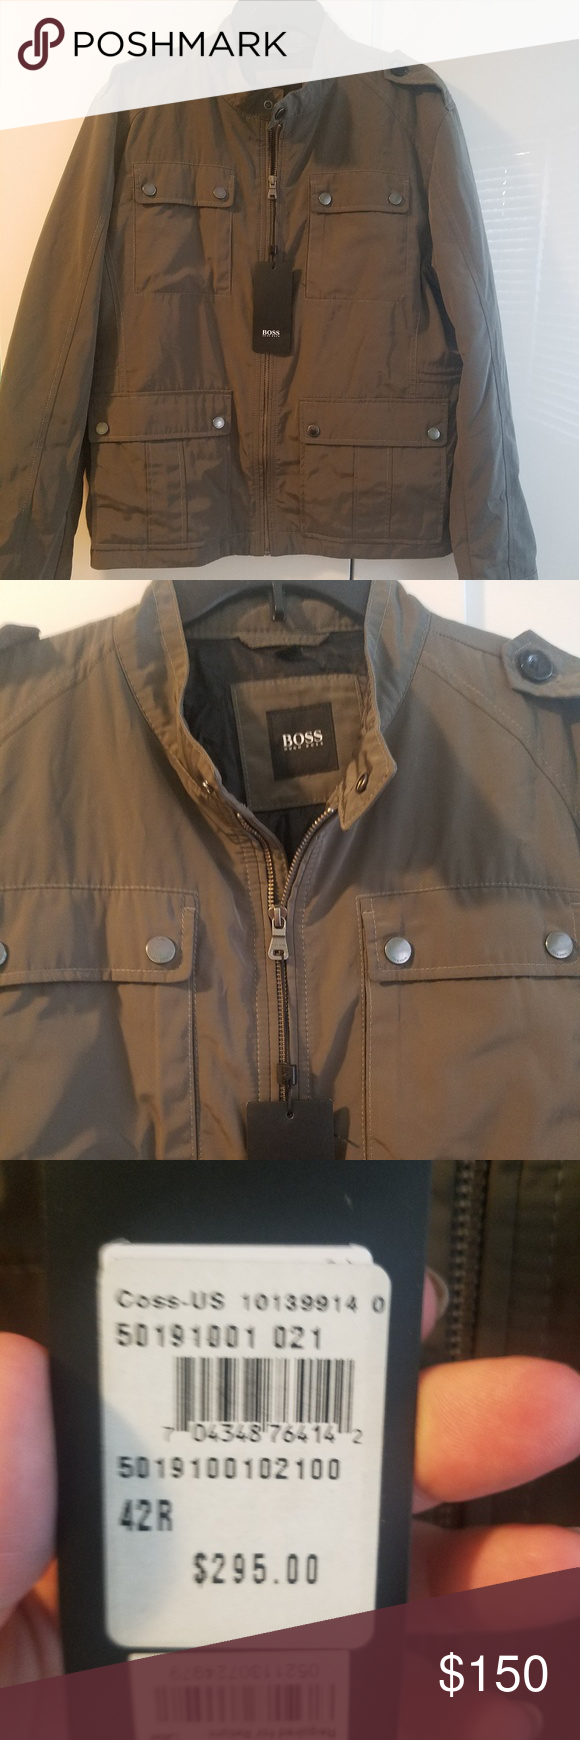 Mens Hugo Boss Lightweight Jacket Nwt Lightweight Jacket Jackets Military Style Jackets [ 1740 x 580 Pixel ]